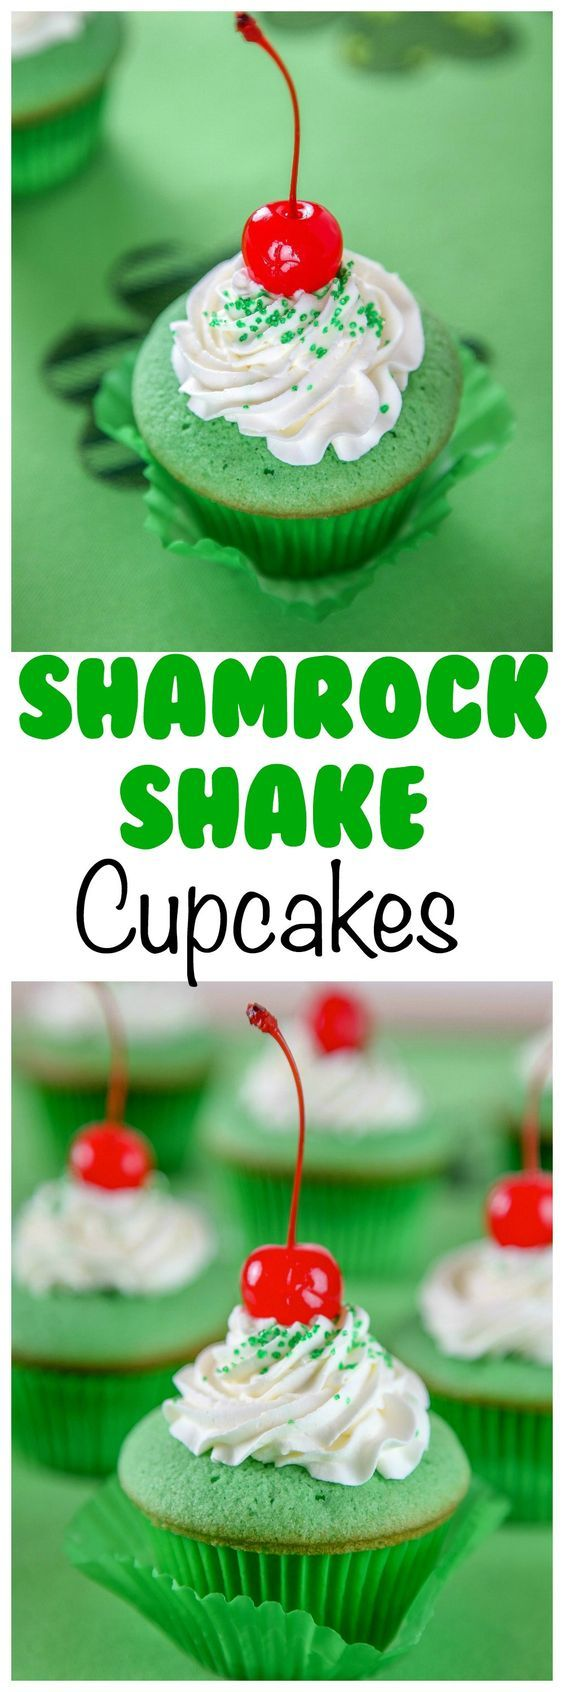 Shamrock Shake Cupcakes Recipe: Moist mint cupcakes topped with white chocolate whipped cream. Your favorite Mcdonald's Shake in cupcake form! (Mcdonalds Chocolate Shake)